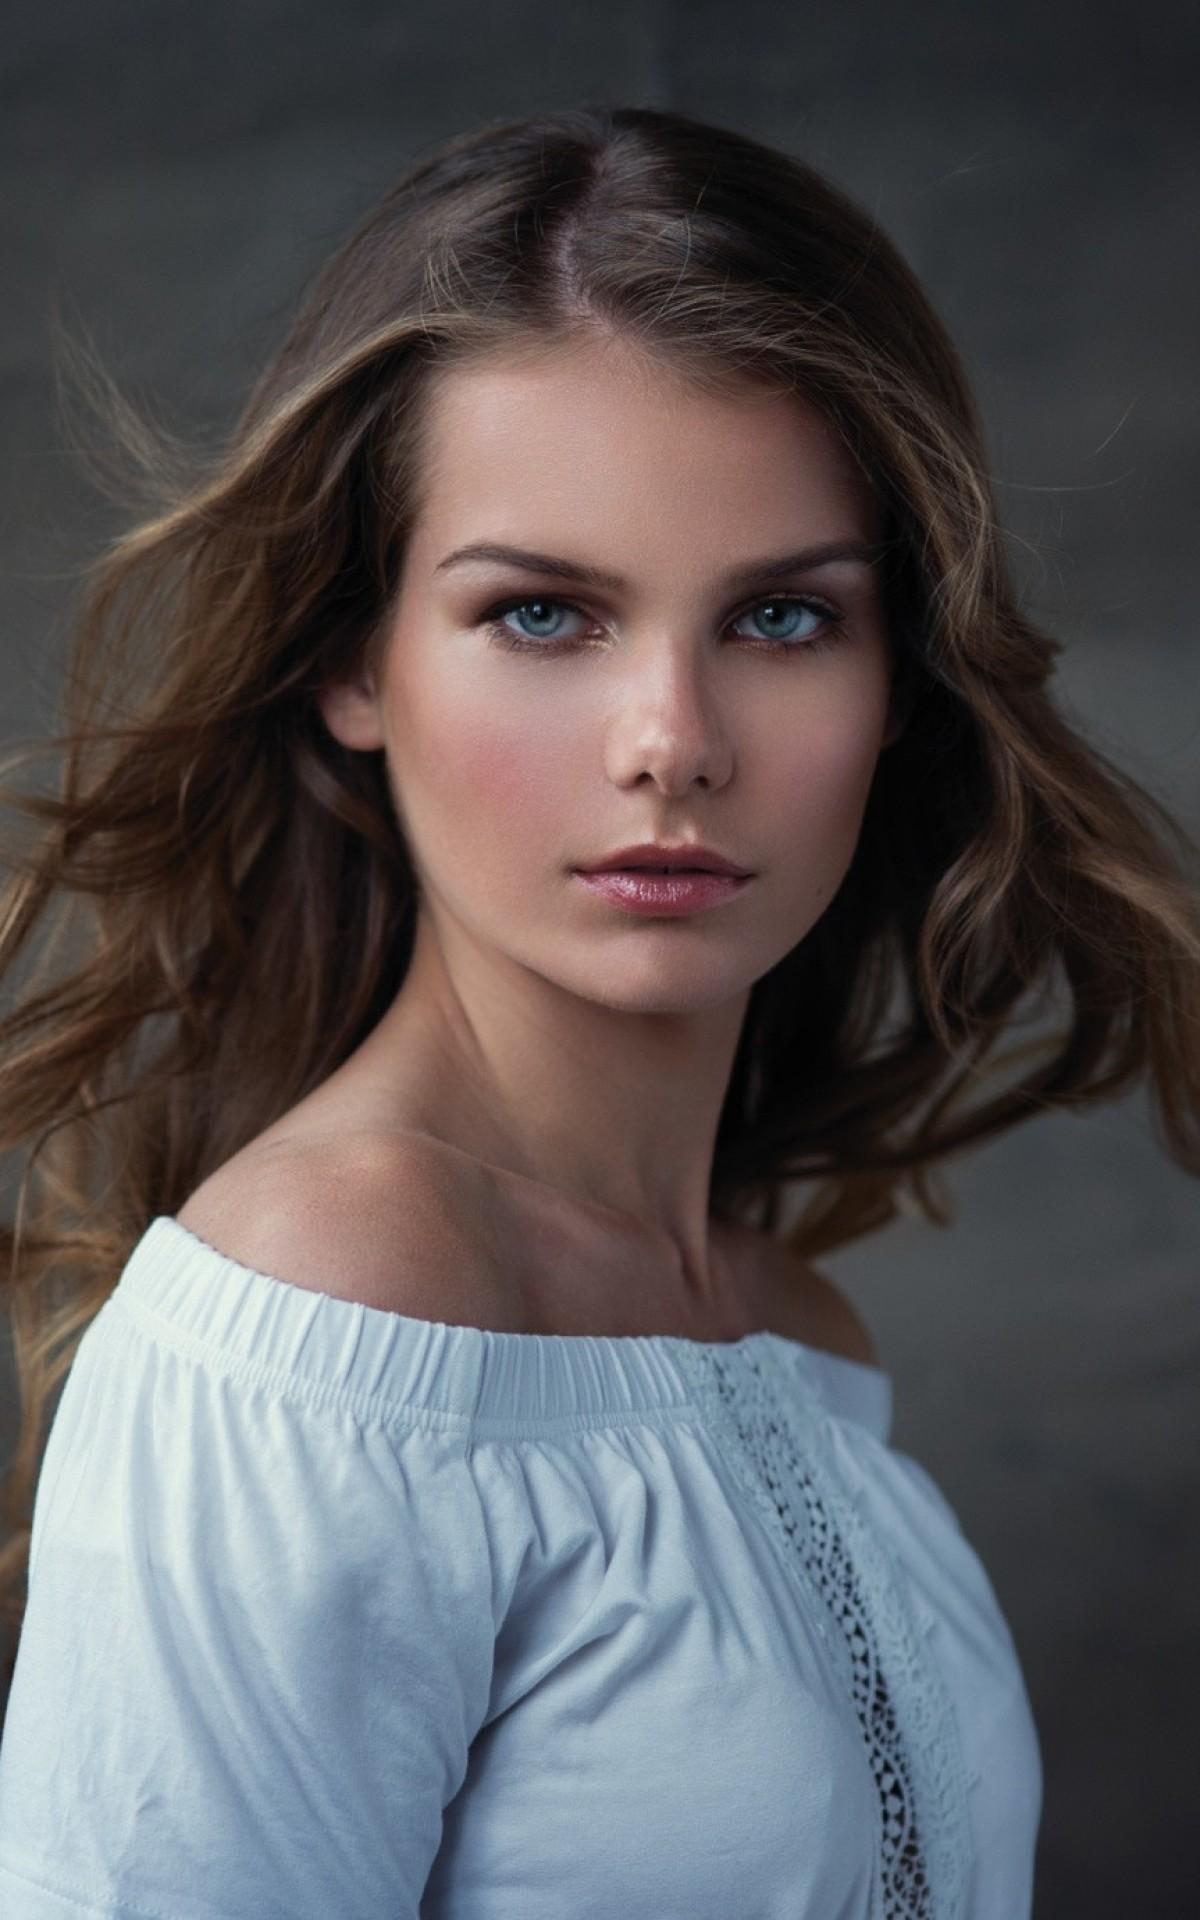 Women, Brunette, Model, Face Portrait, Semi Profile View